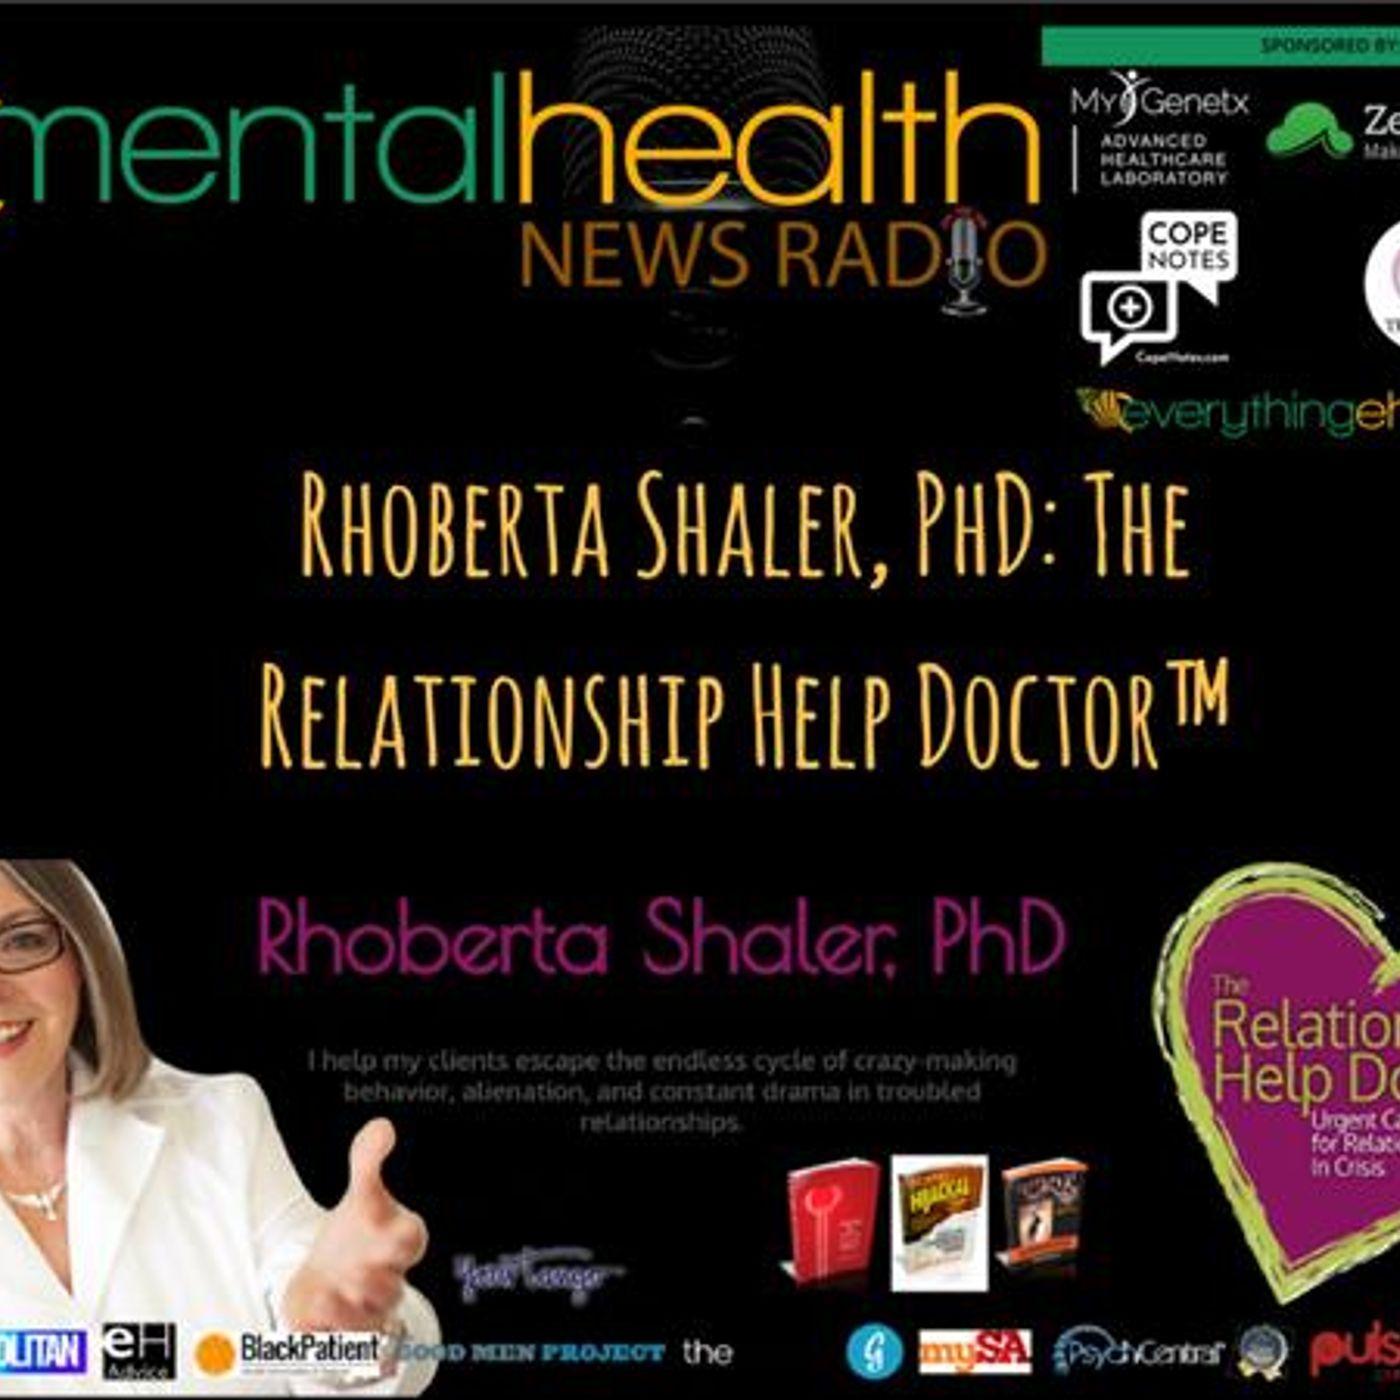 Mental Health News Radio - Rhoberta Shaler, PhD: The Relationship Help Doctor